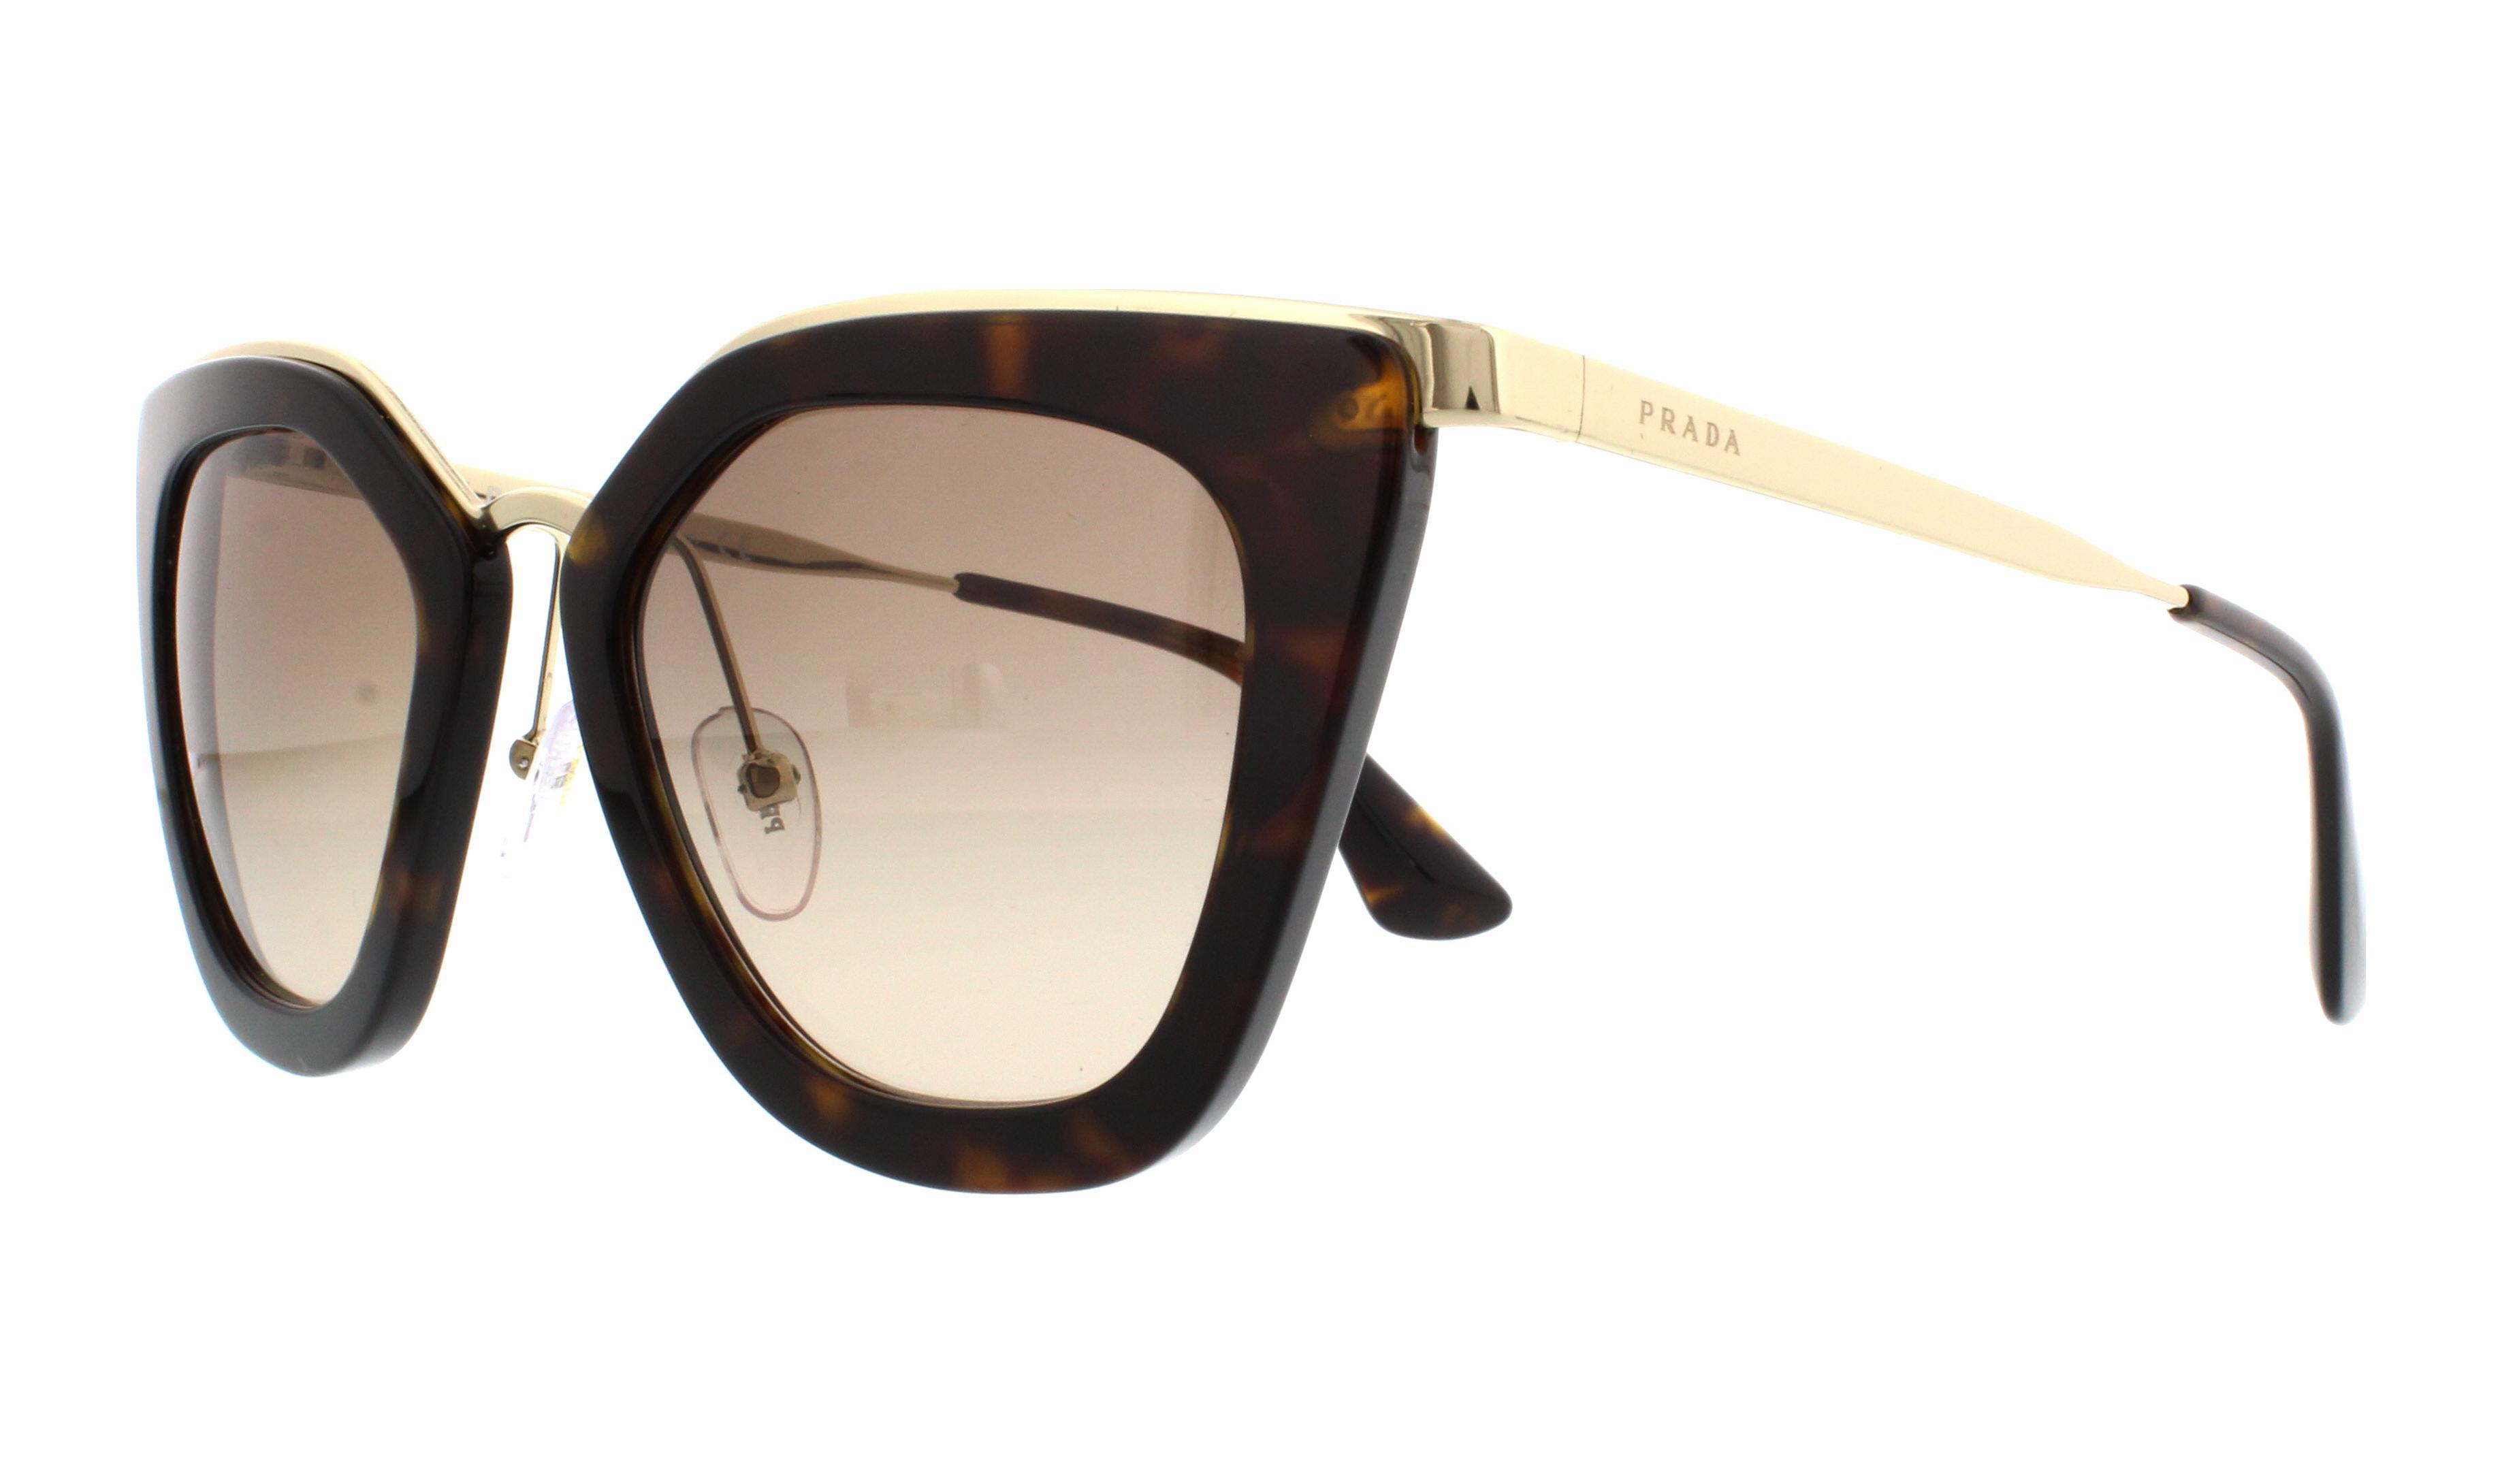 3320abf1407 where to buy prada sunglasses guarantee your satisfaction 18bf9 3b57c